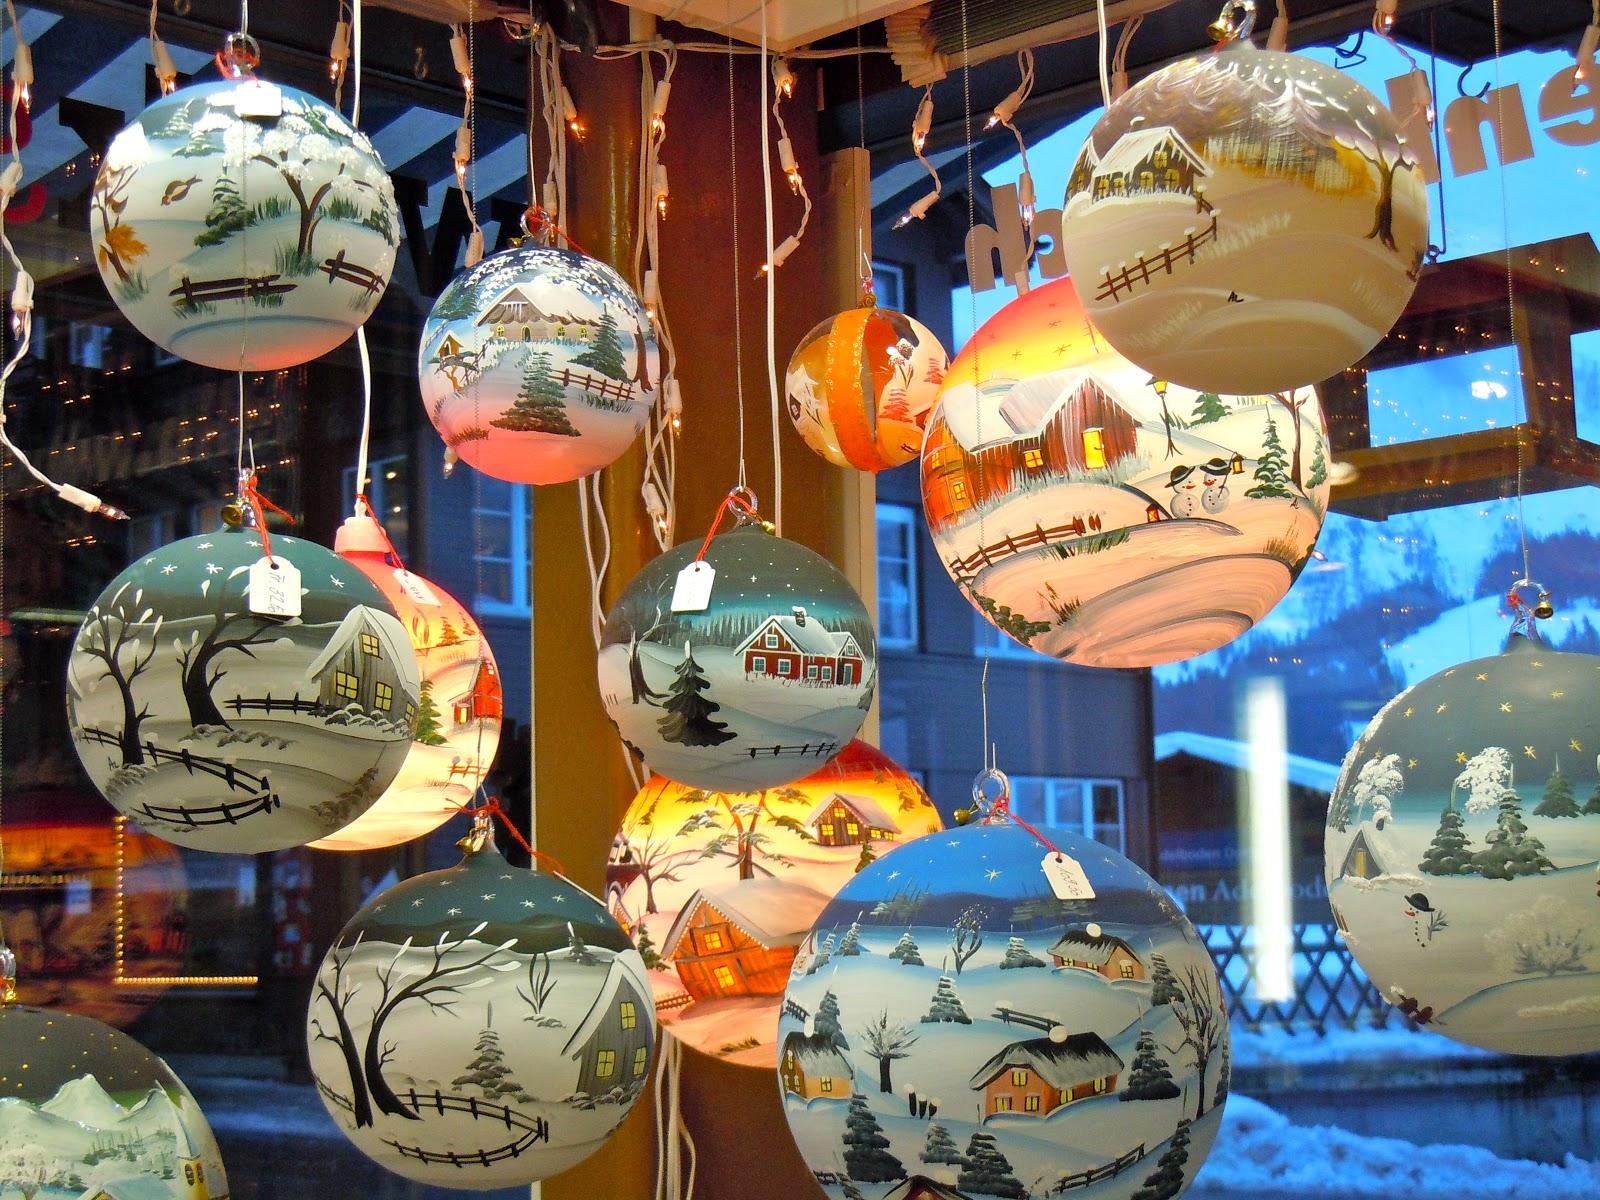 #118EBA Pictures On Christmas Decorations In Switzerland Easy  5545 decorations noel geneve 1600x1200 px @ aertt.com